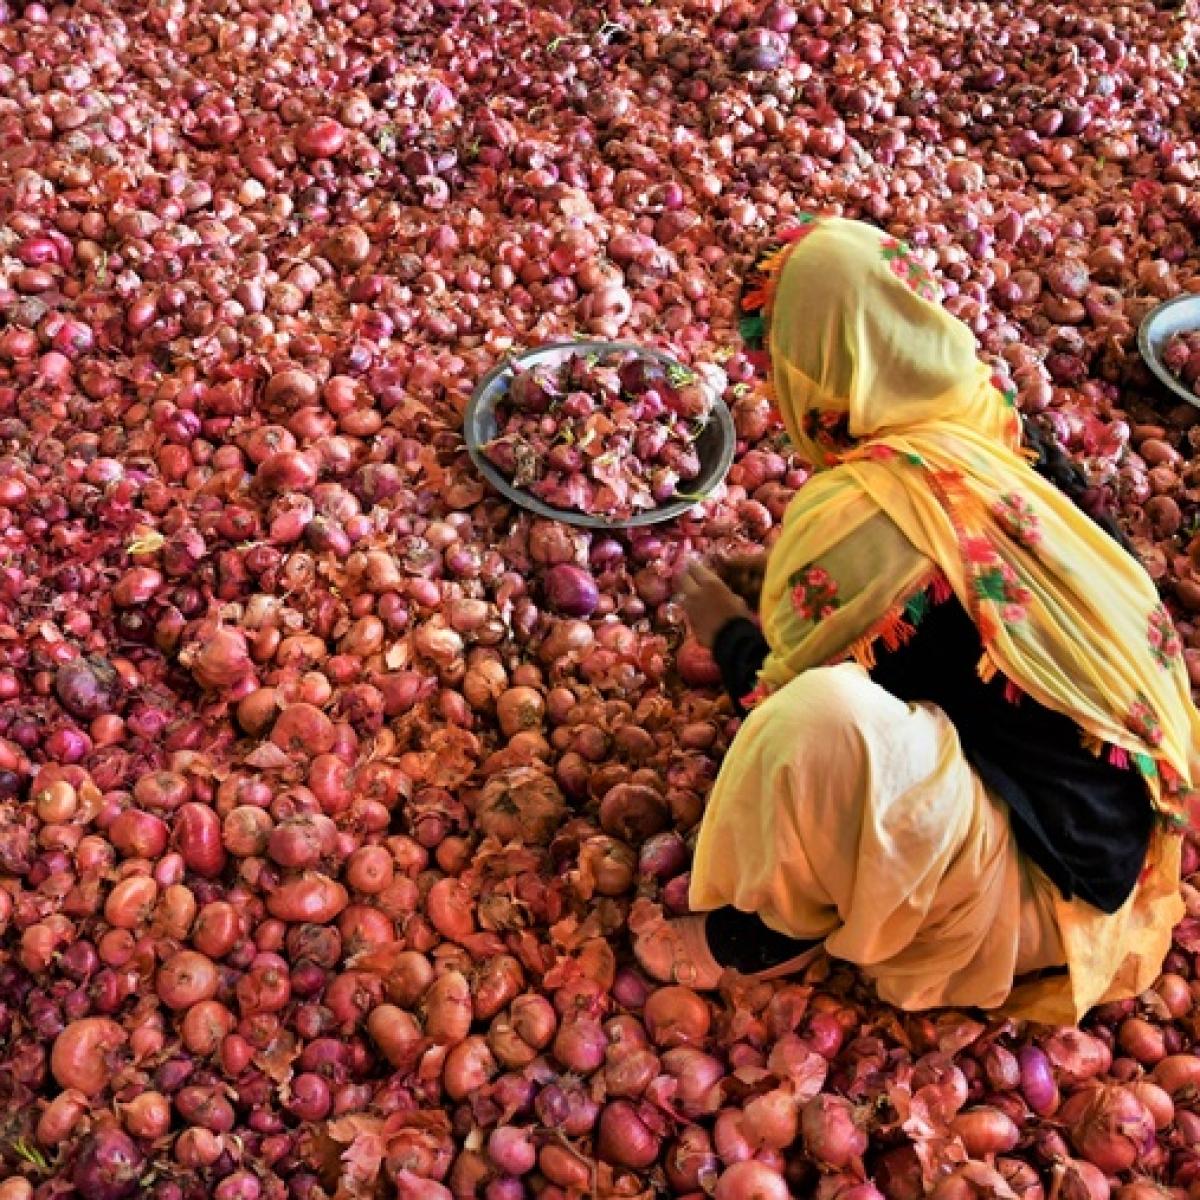 Pune: Two held for stealing 550 kg onions in Devjali village